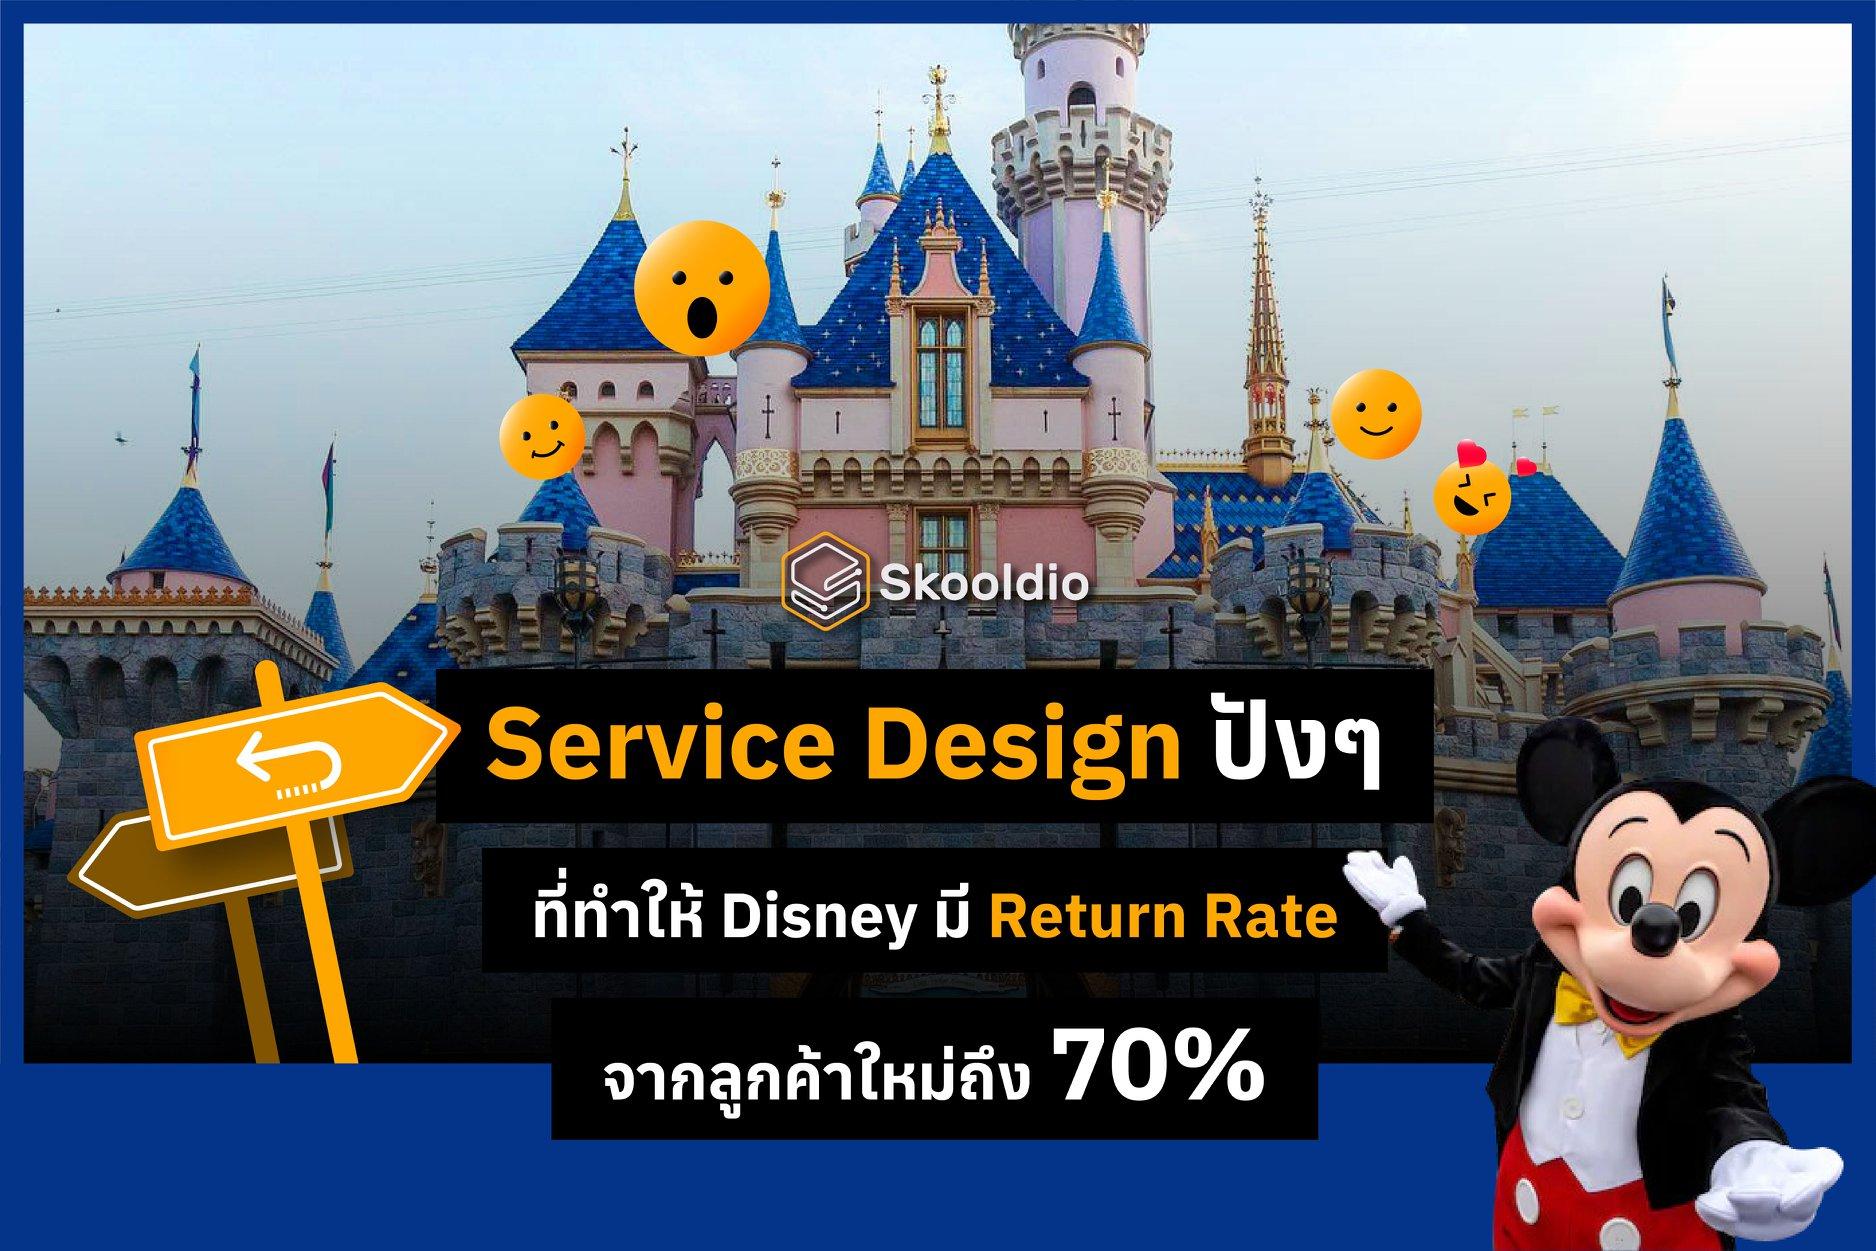 Service Design ปังๆ ที่ทำให้ Disney มี Return Rate จากลูกค้าใหม่ถึง 70% | Skooldio Blog